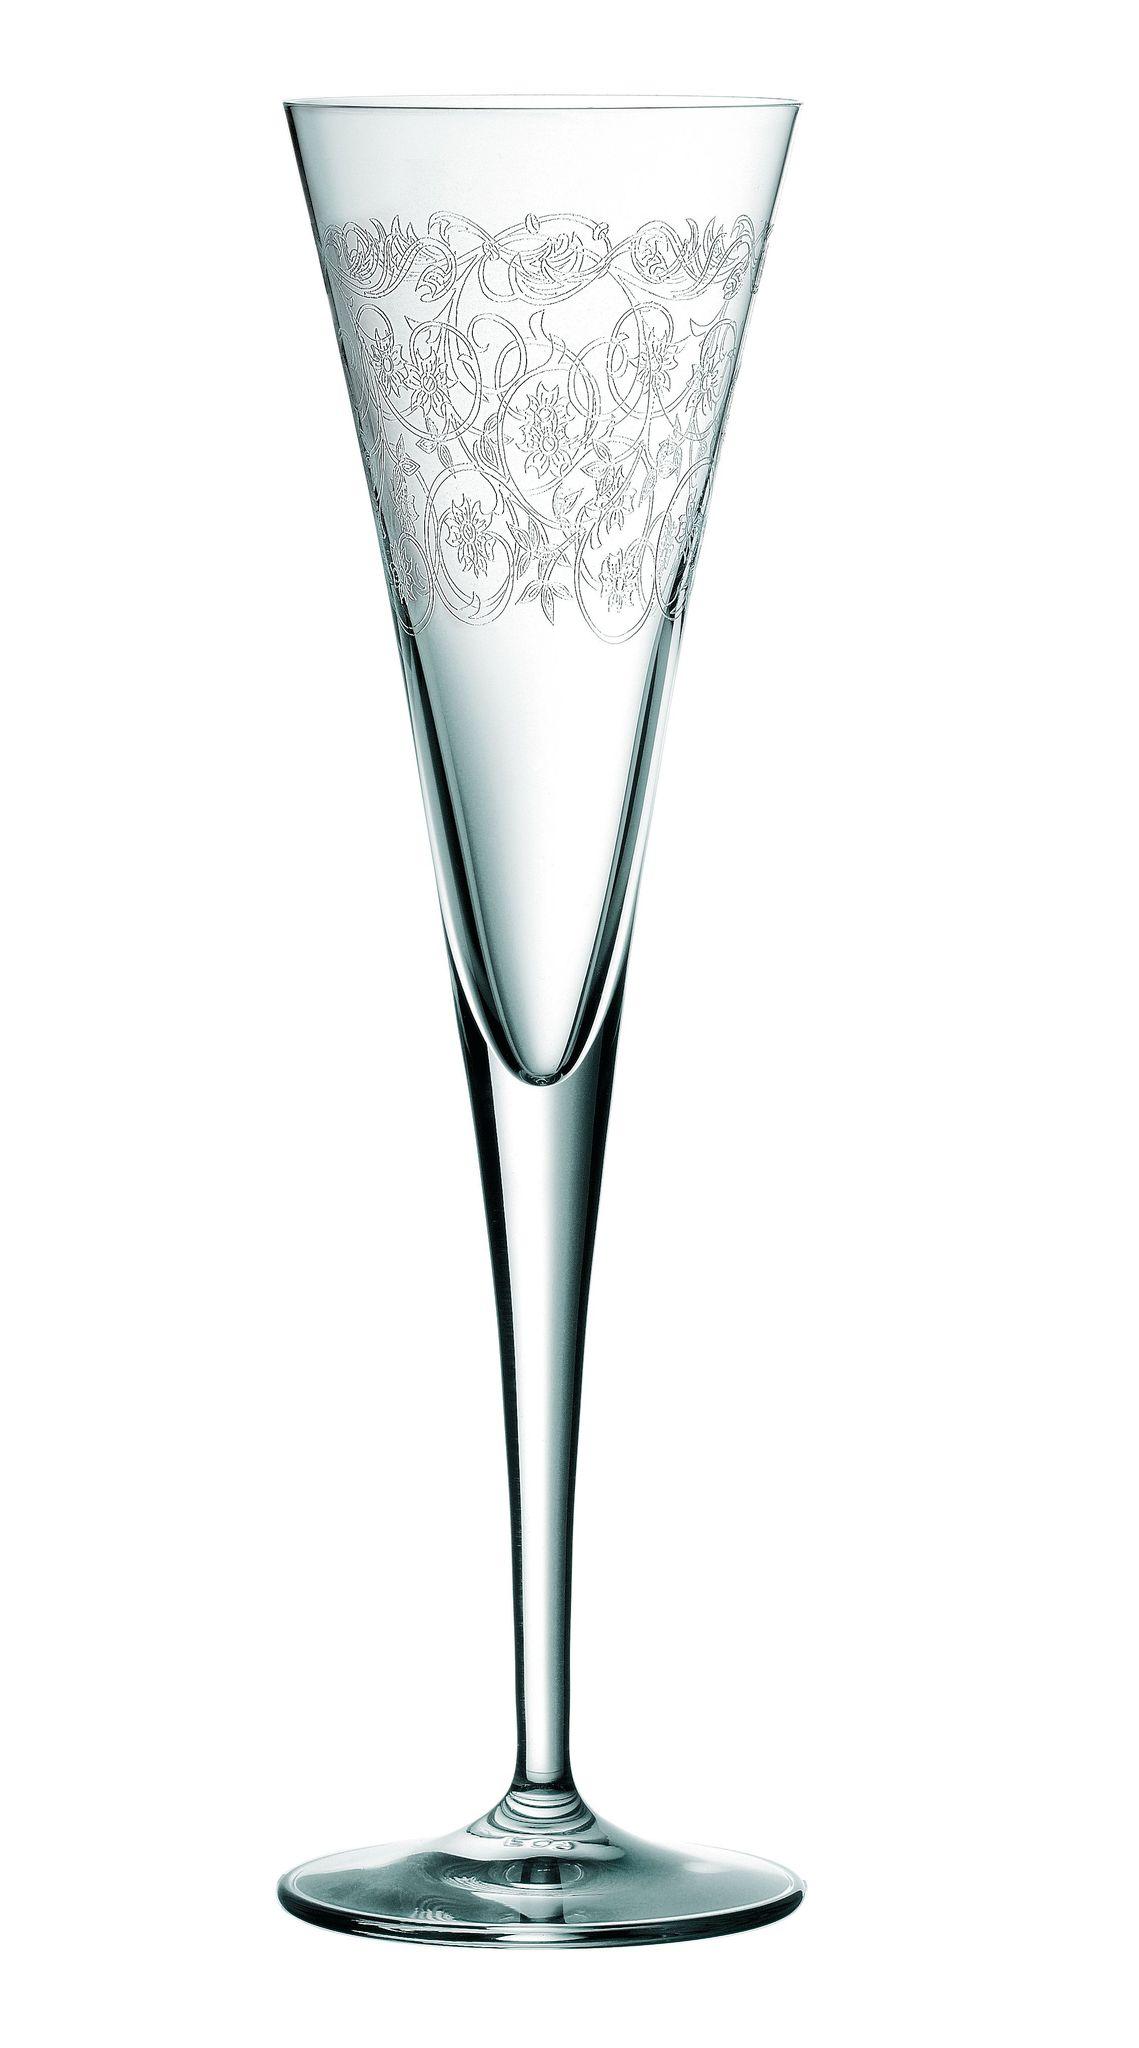 Бокалы Бокал для шампанского 165мл Nachtmann Delight Design 3 bokal-dlya-shampanskogo-165ml-nachtmann-delight-design-3-germaniya.jpg